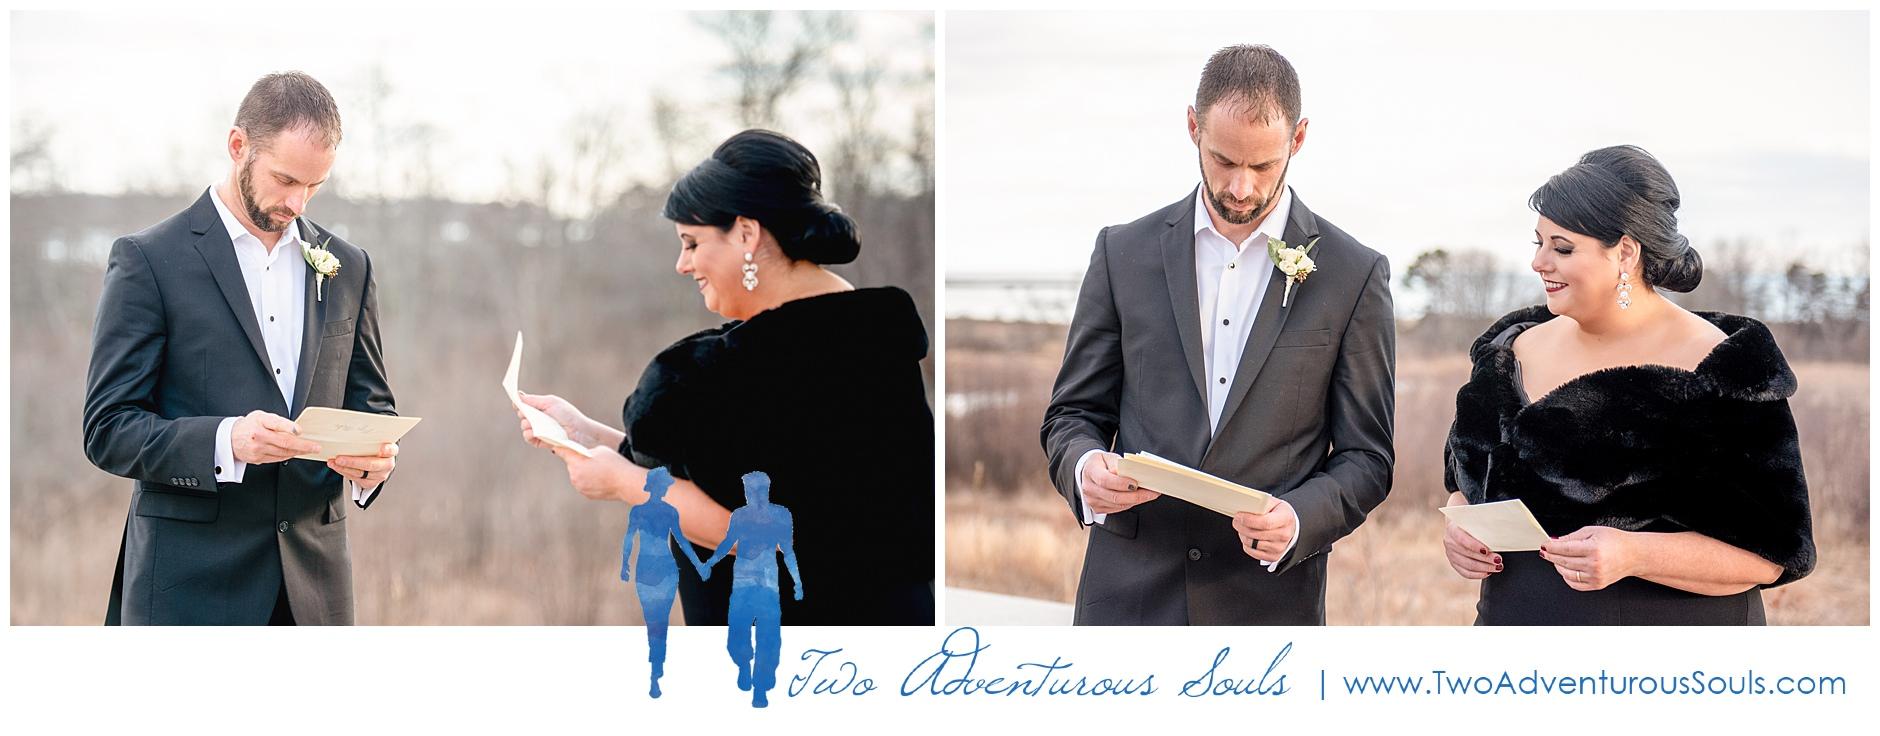 Inn by The Sea Elopement, Maine Elopement Photographer, Maine Wedding Photographers, Two Adventurous Souls_040619_0010.jpg